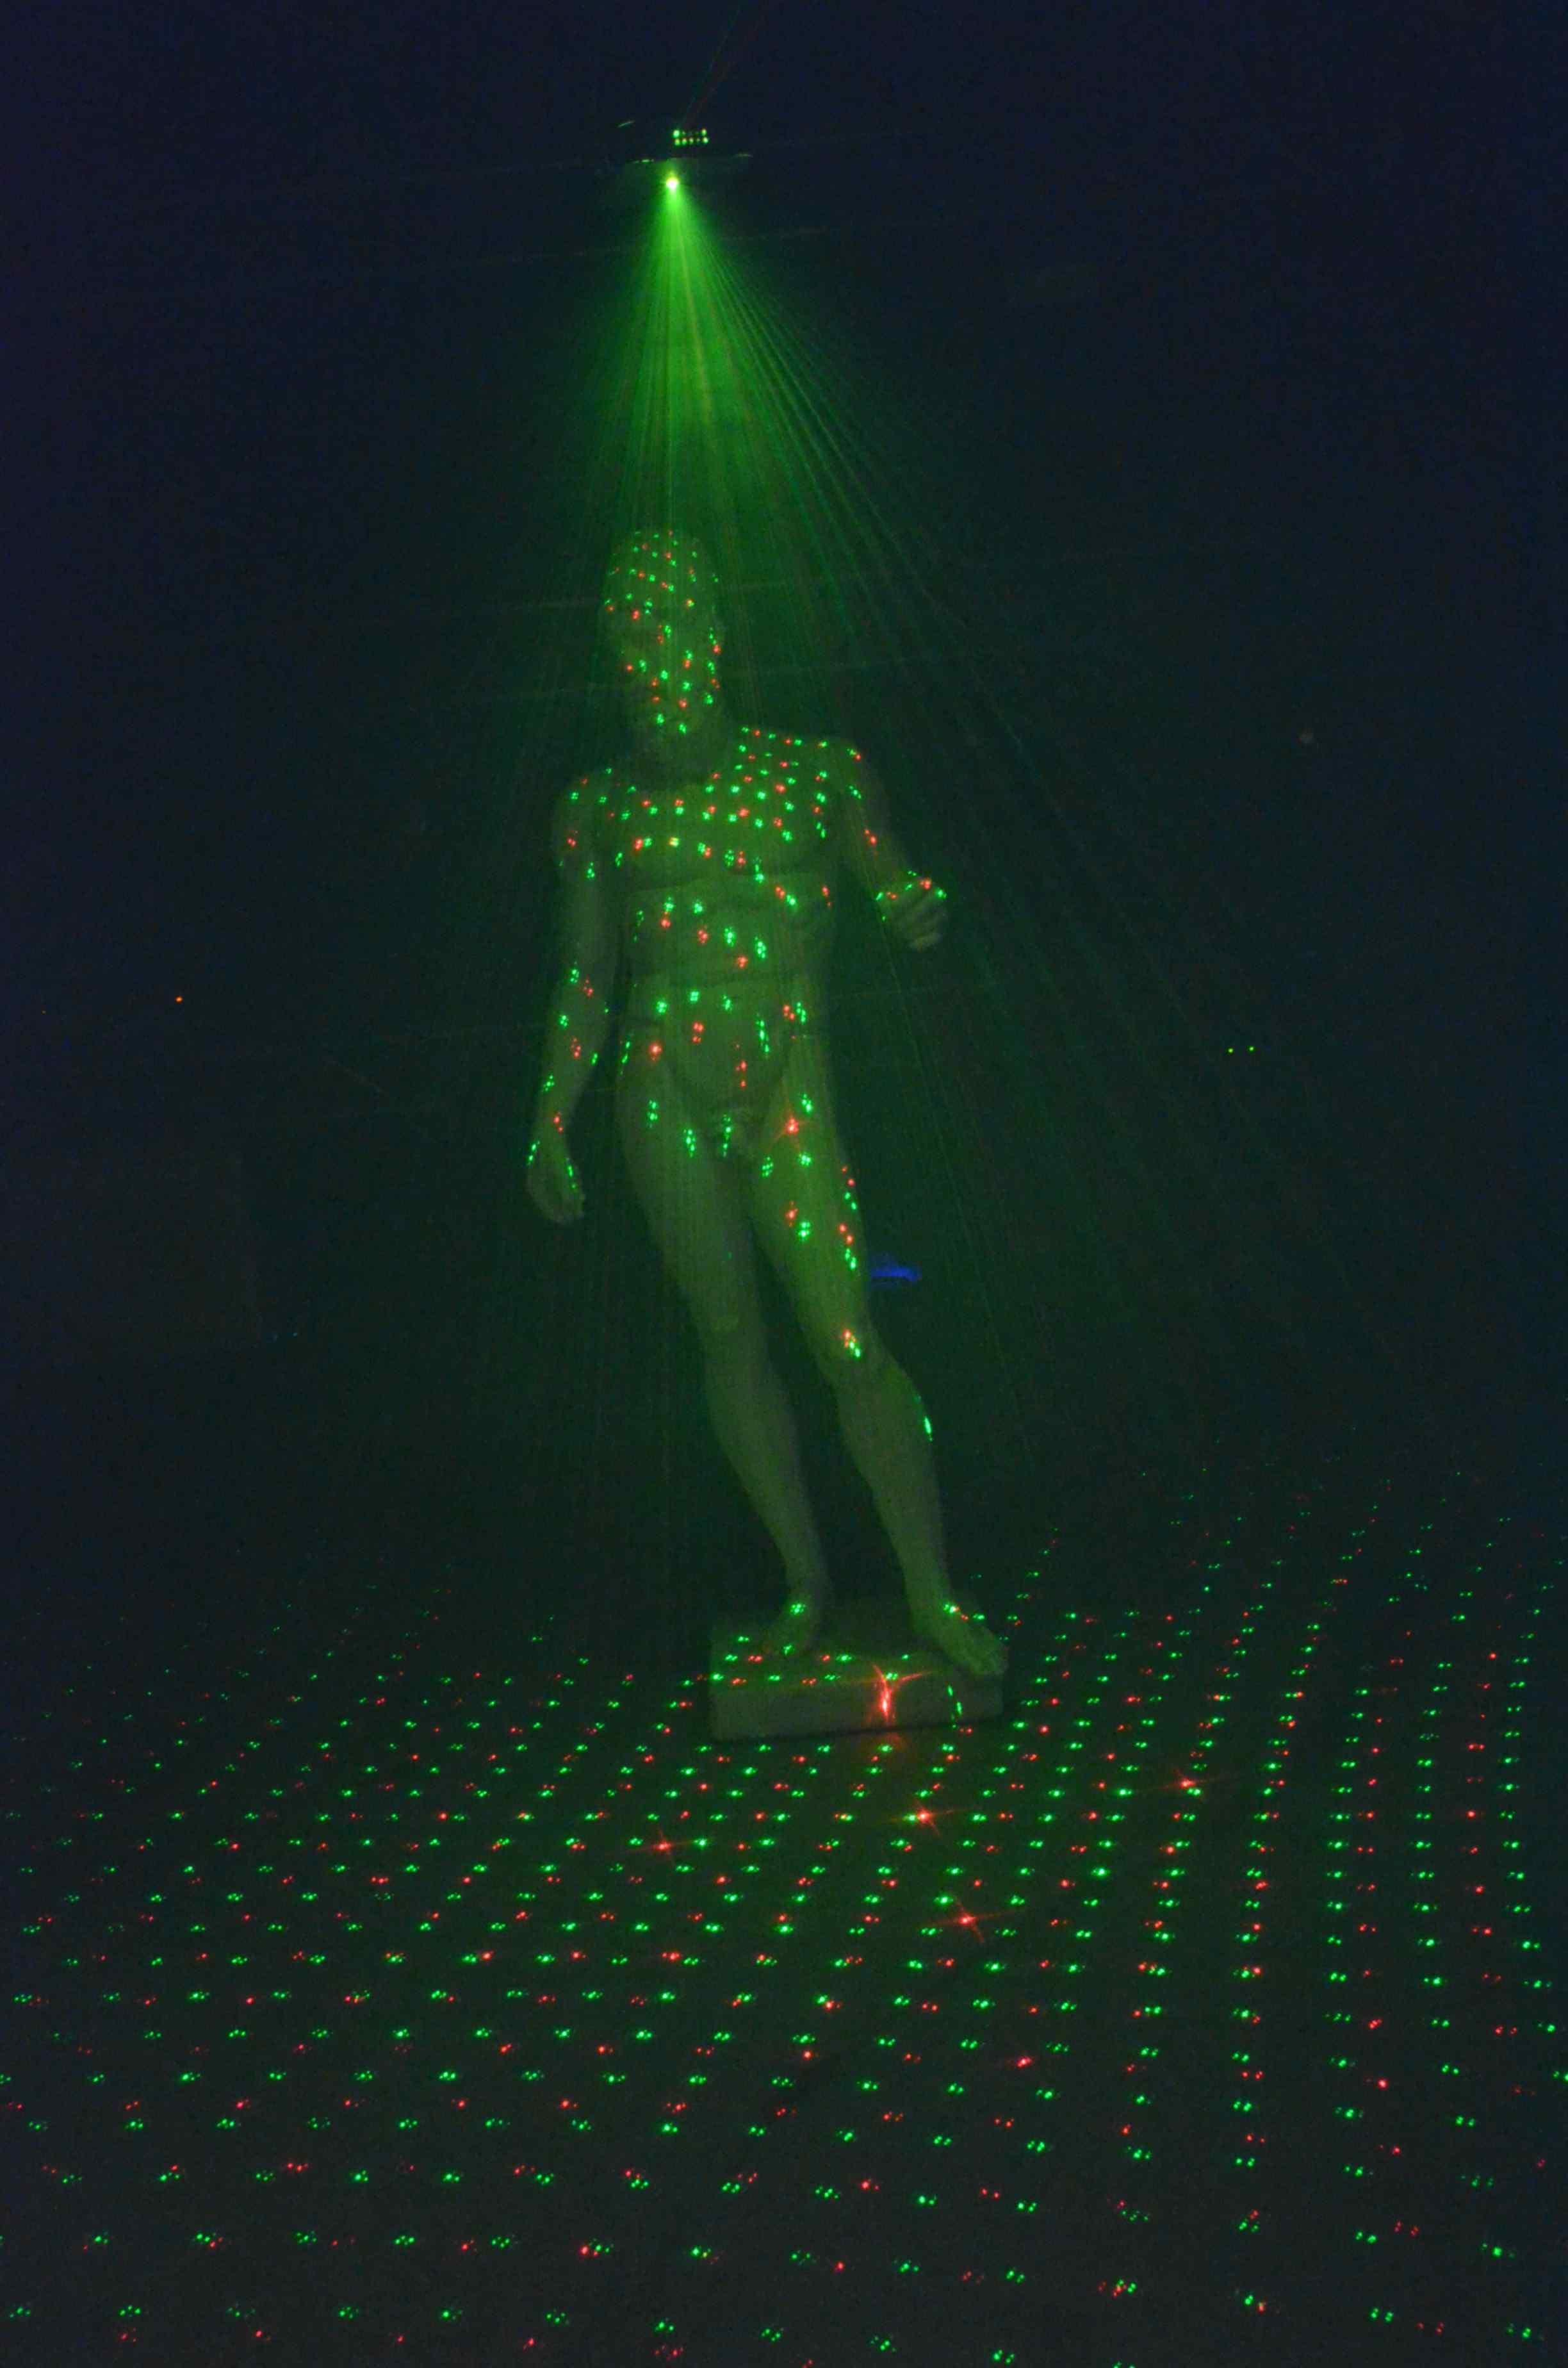 Luci Da Discoteca Fai Da Te.Sistemi Di Isolamento Termico Come Fare Luci Da Discoteca In Casa